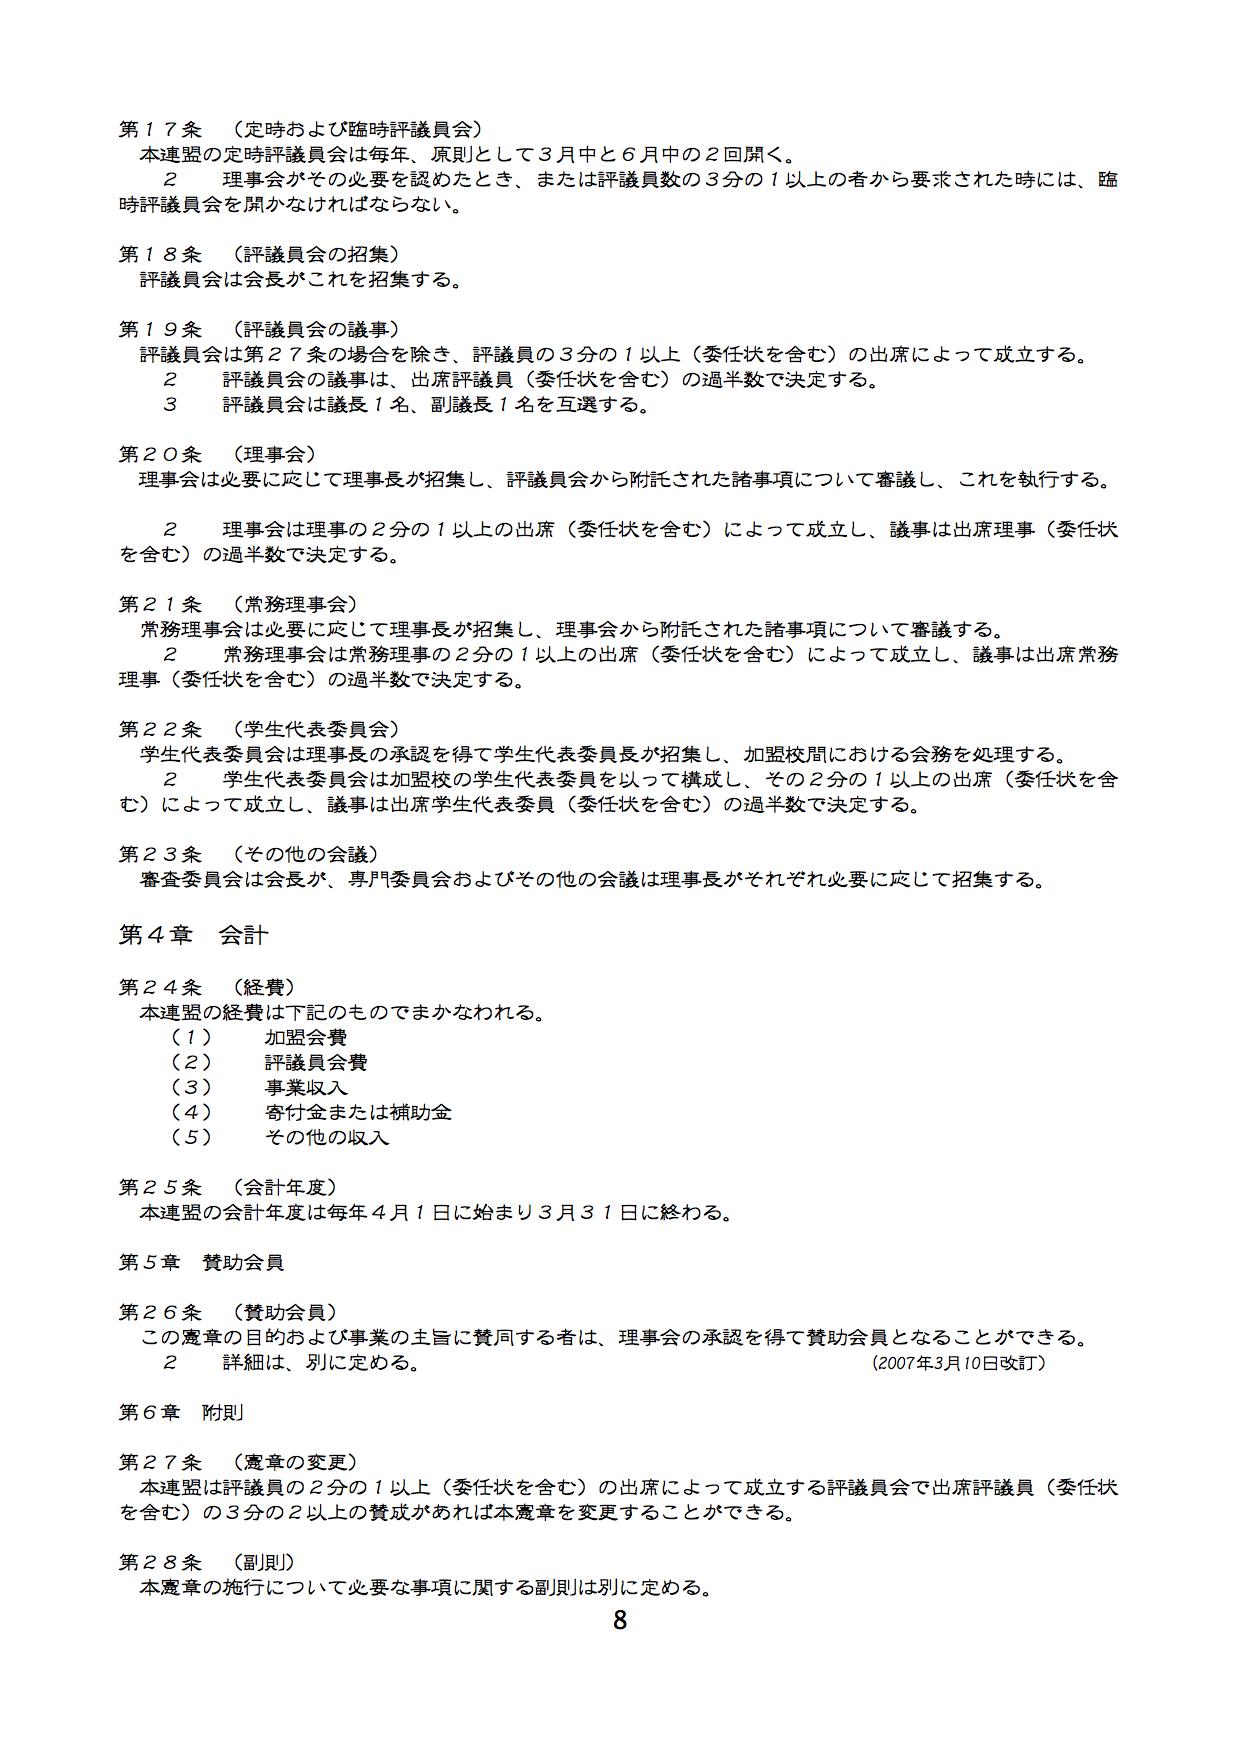 15jicf_gakuren_annai_150621_jicf_kensho_00003